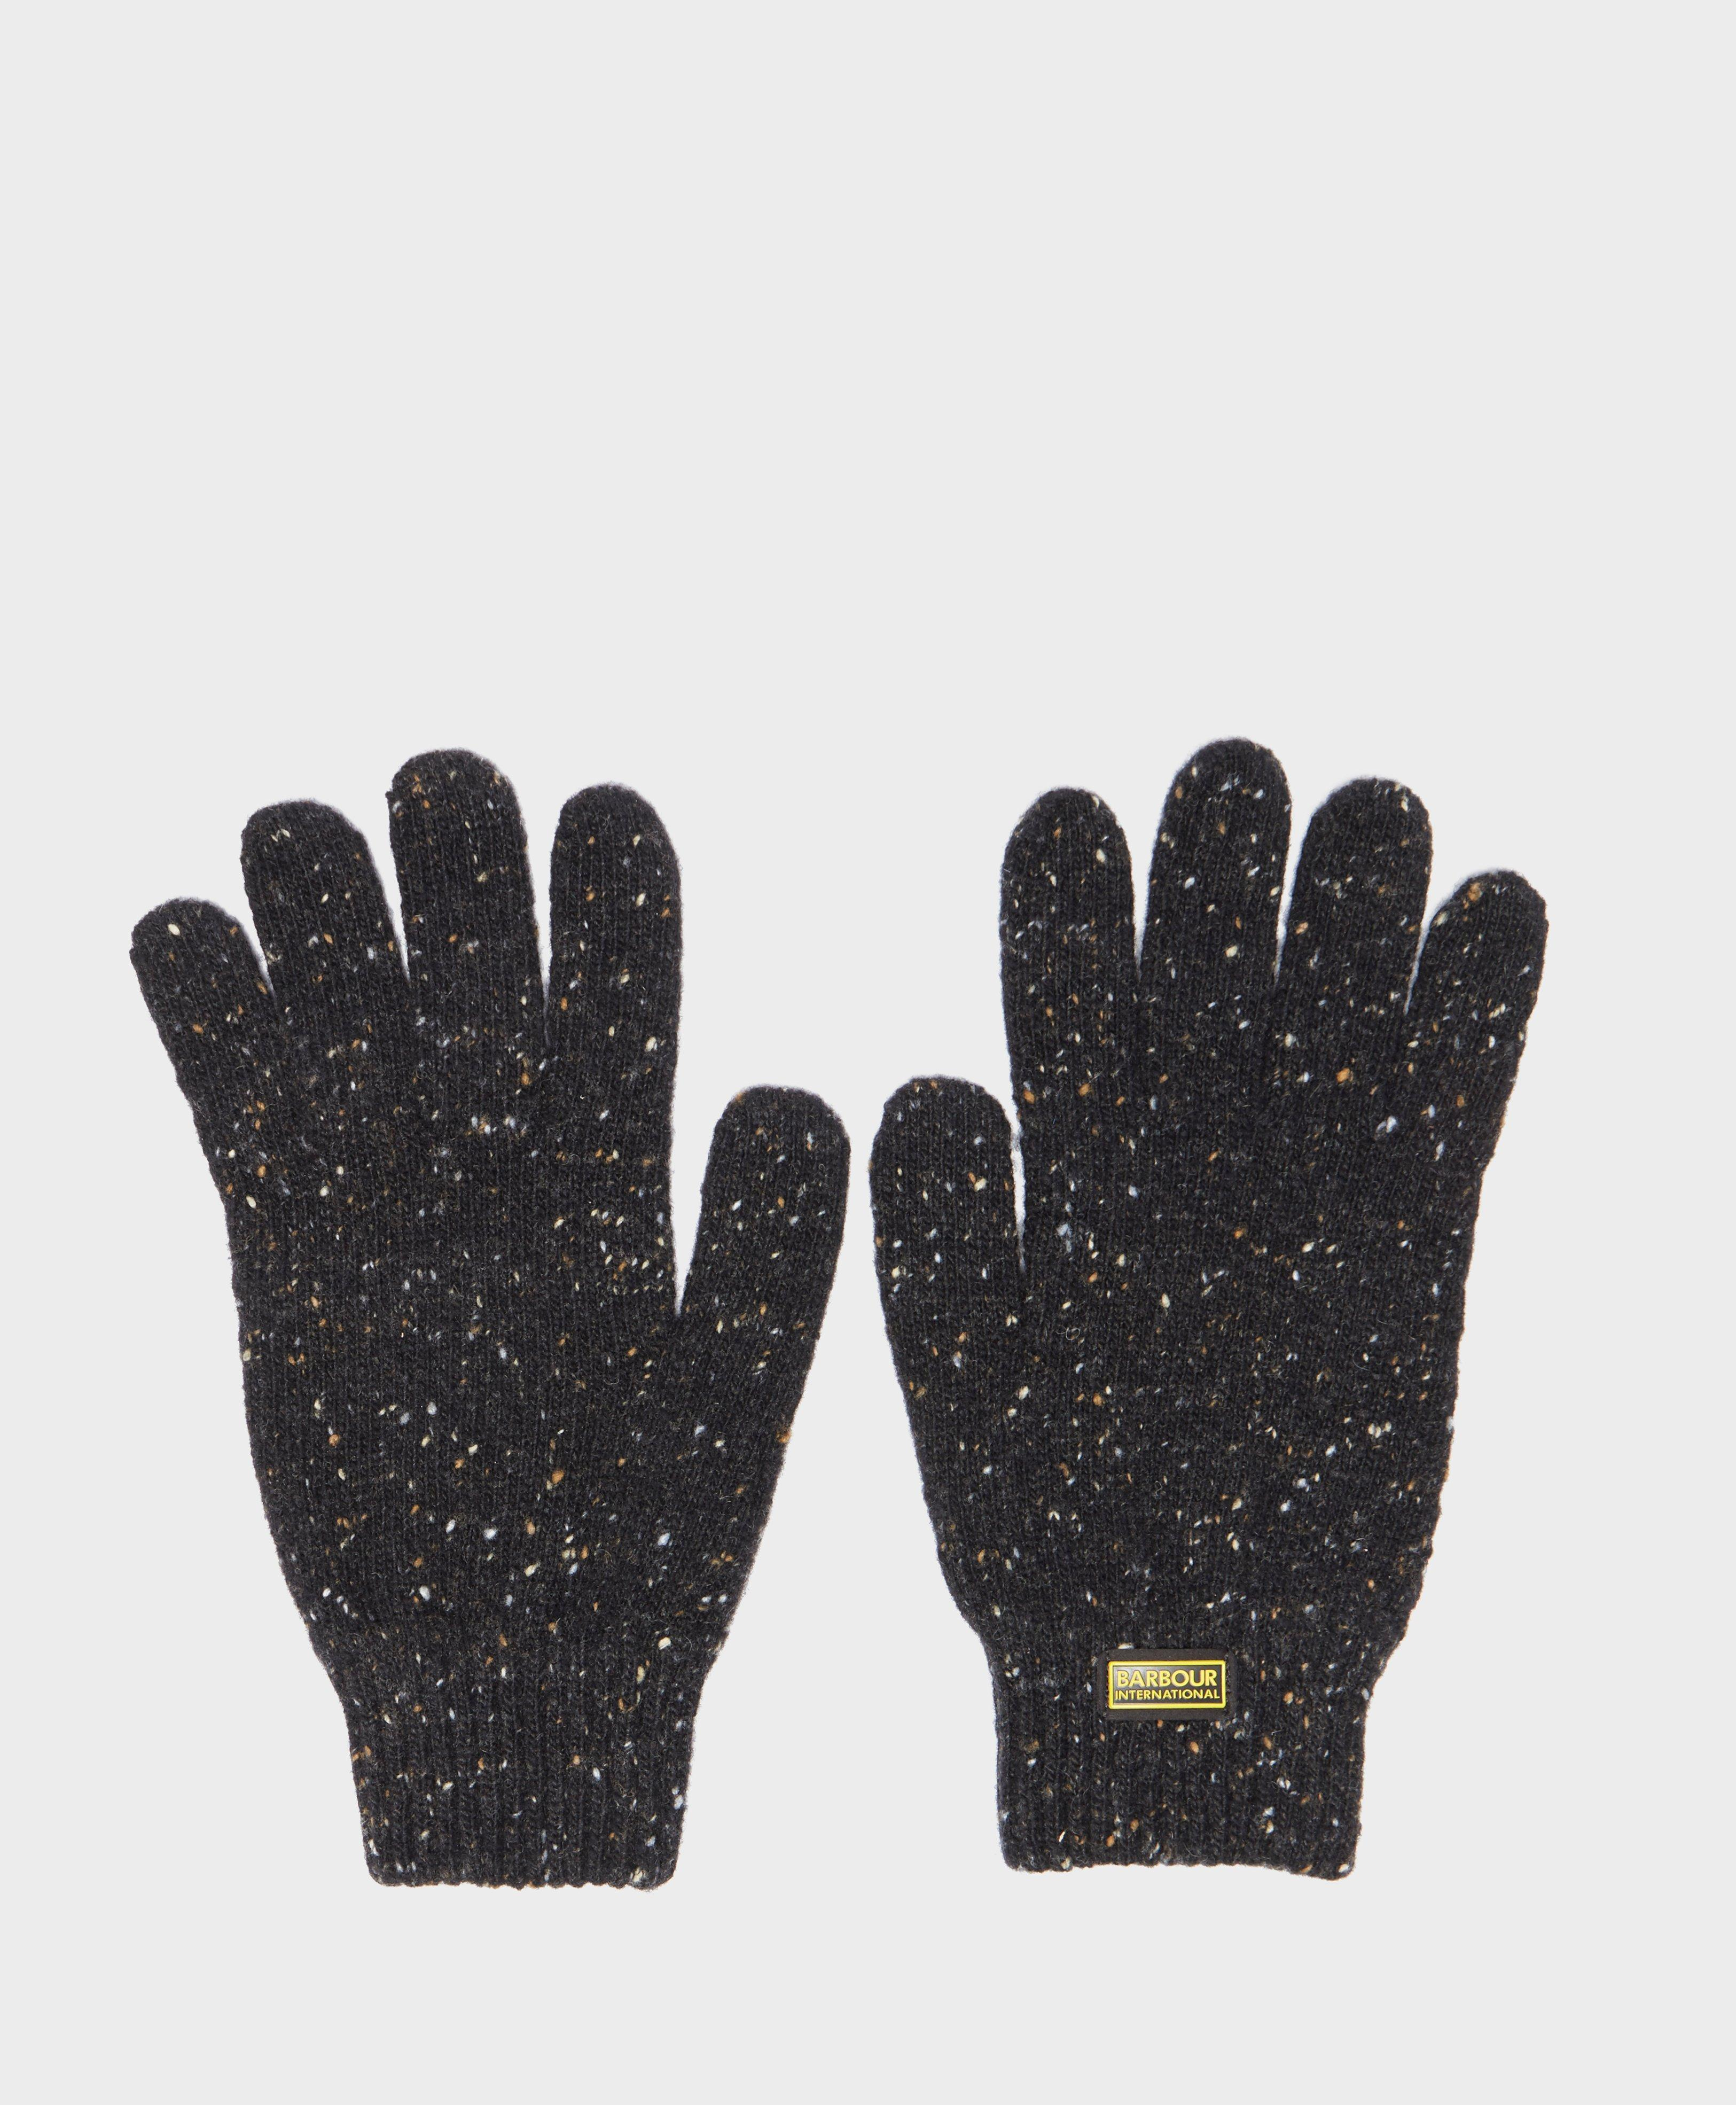 Barbour International Knit Gloves in Black for Men - Lyst